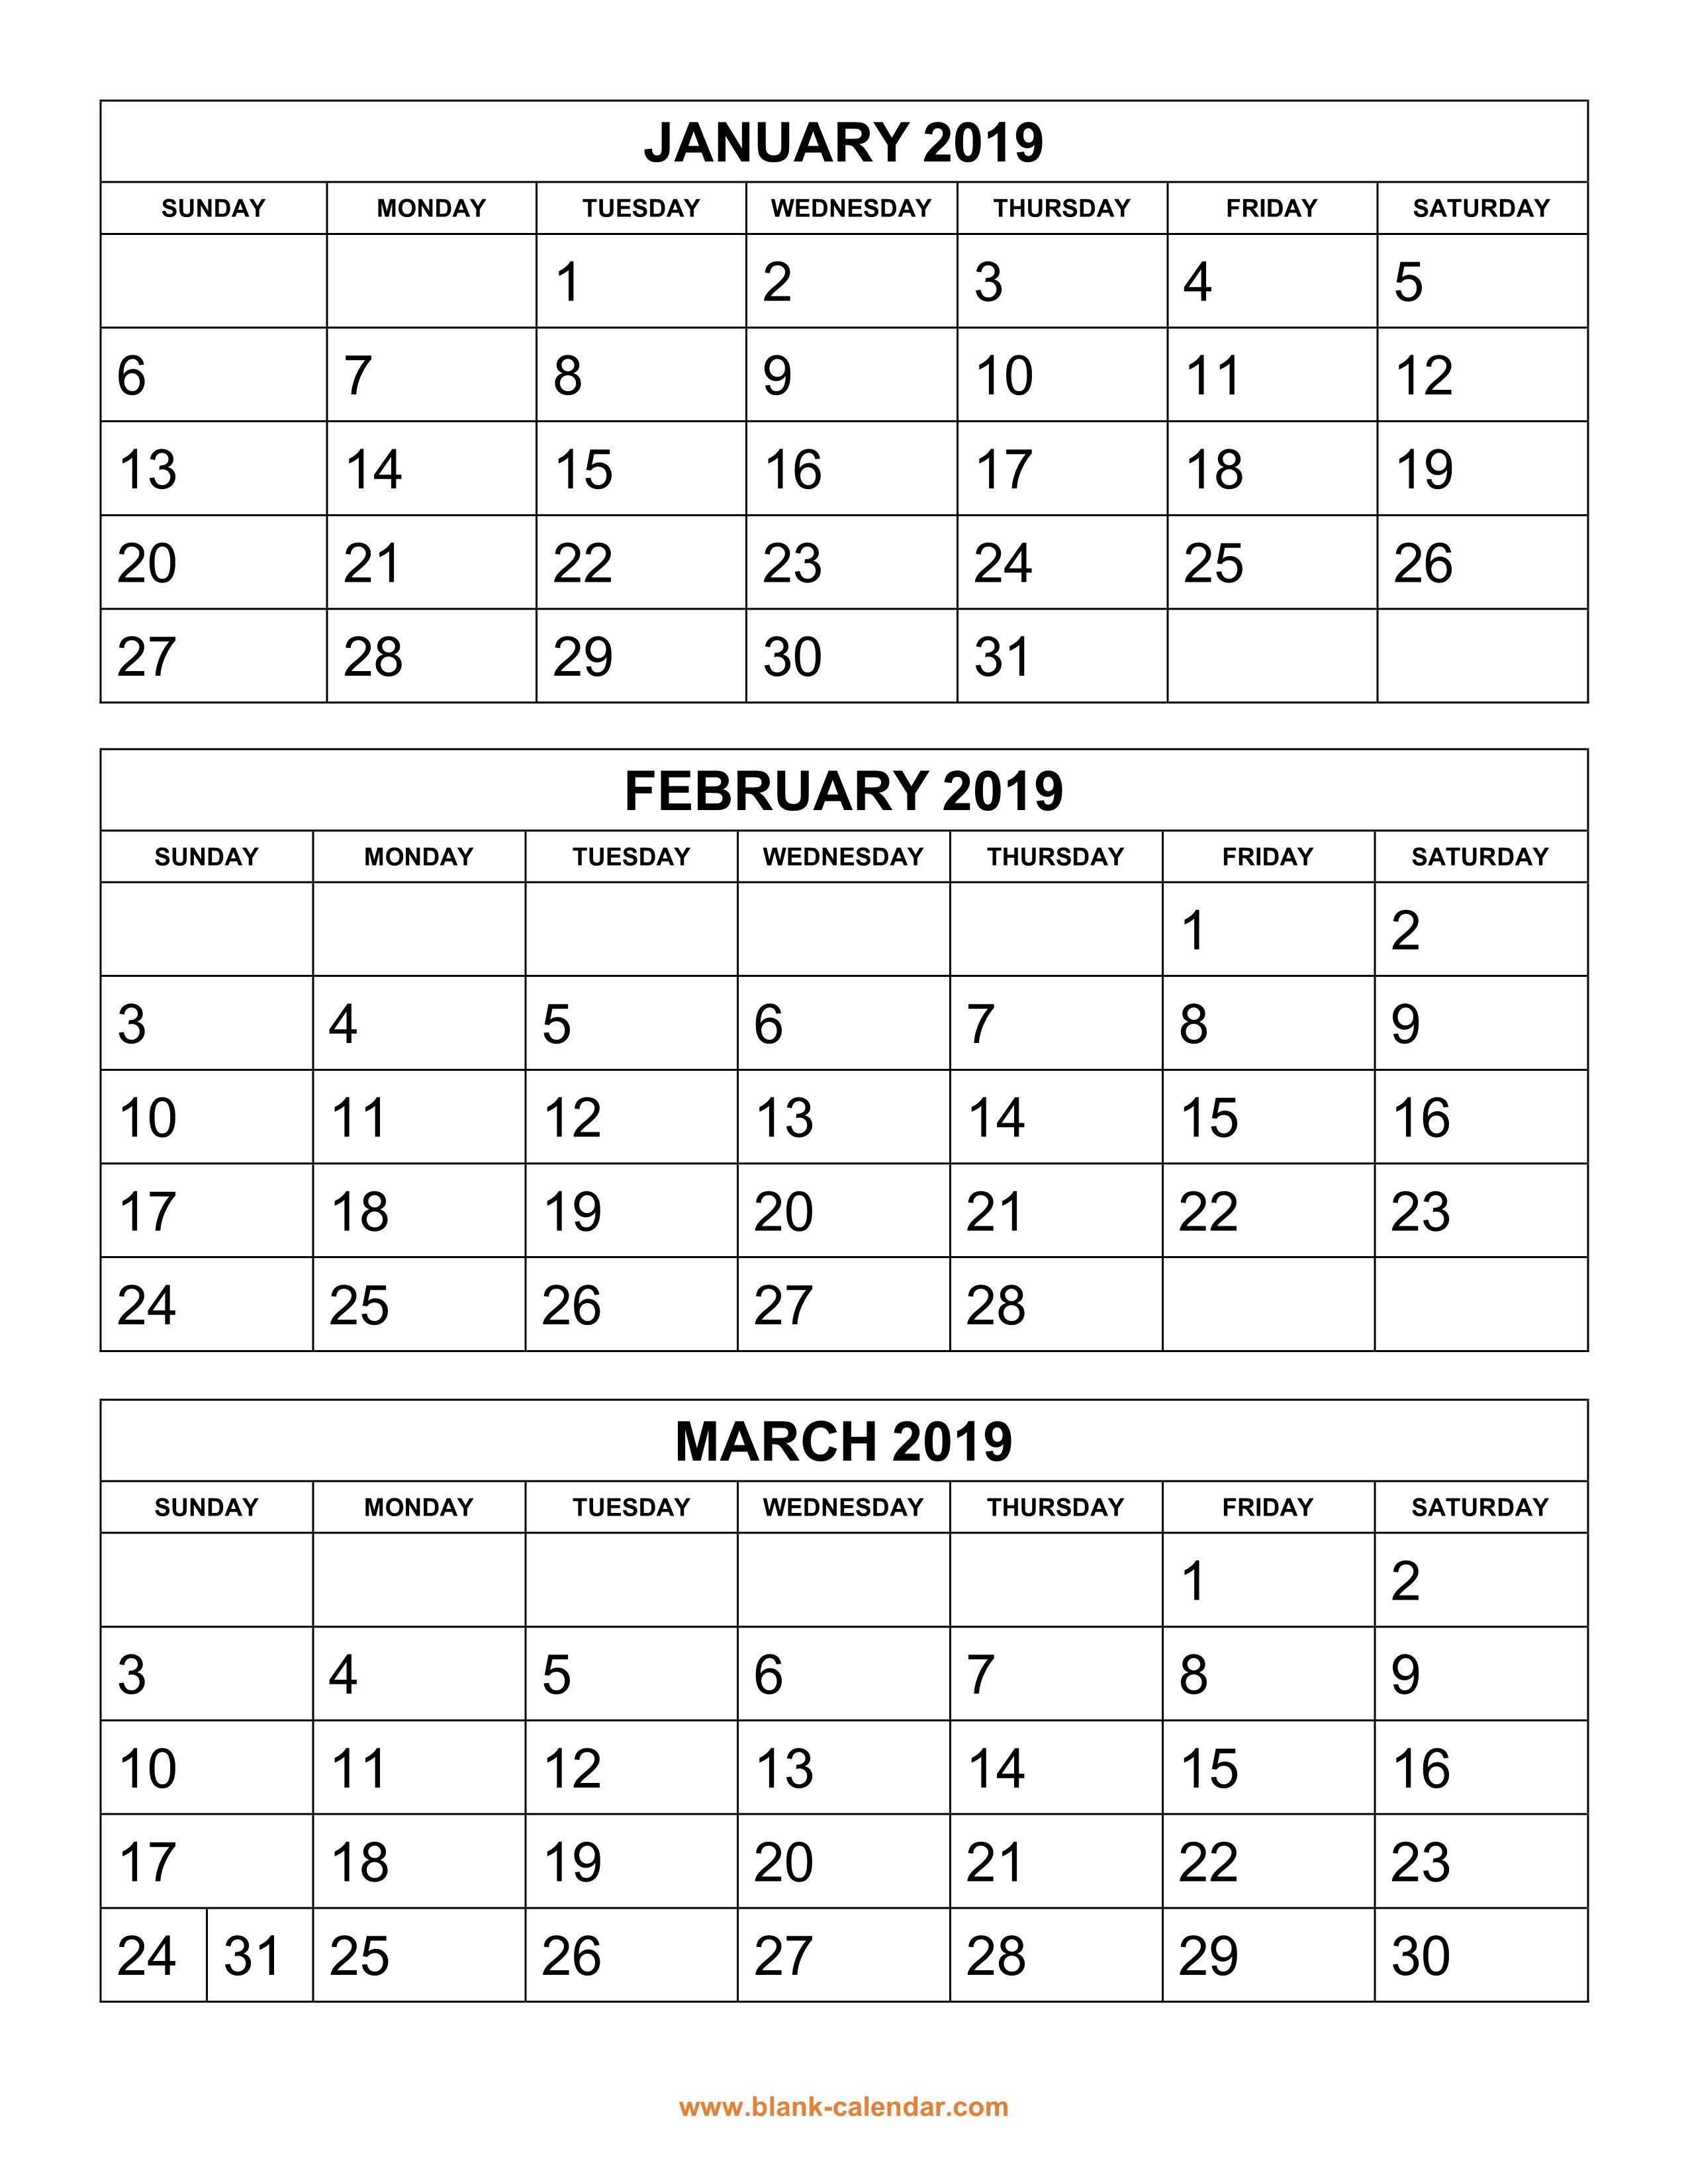 Free Download Printable Calendar 2019, 3 Months Per Page, 4 Pages 2019 Calendar 6 Months Per Page